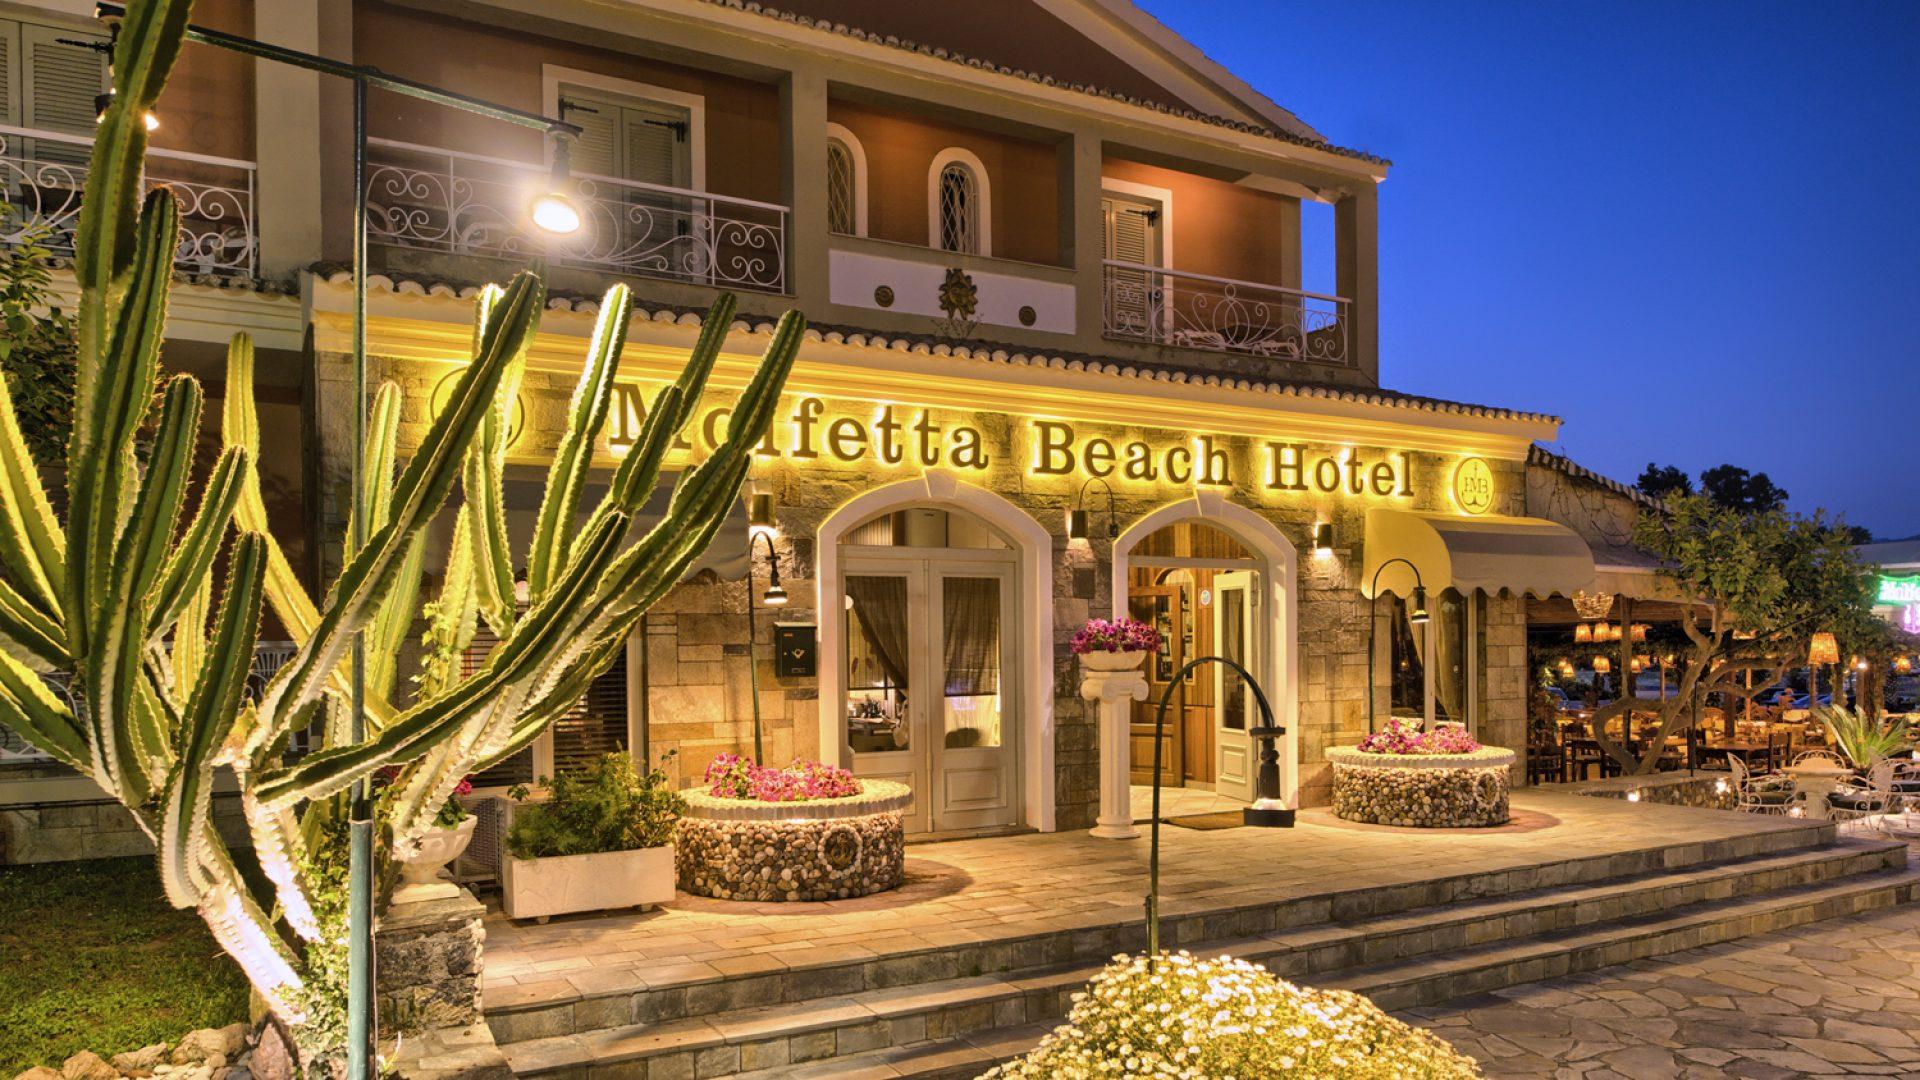 Molfetta Beach Hotel - Κερκυρα ✦ 2 Ημερες (1 Διανυκτερευση) ✦ 2 ατομα ✦ Πρωινο ✦ 01/06/2021 εως 30/06/2021 ✦ Μπροστα στην παραλια!